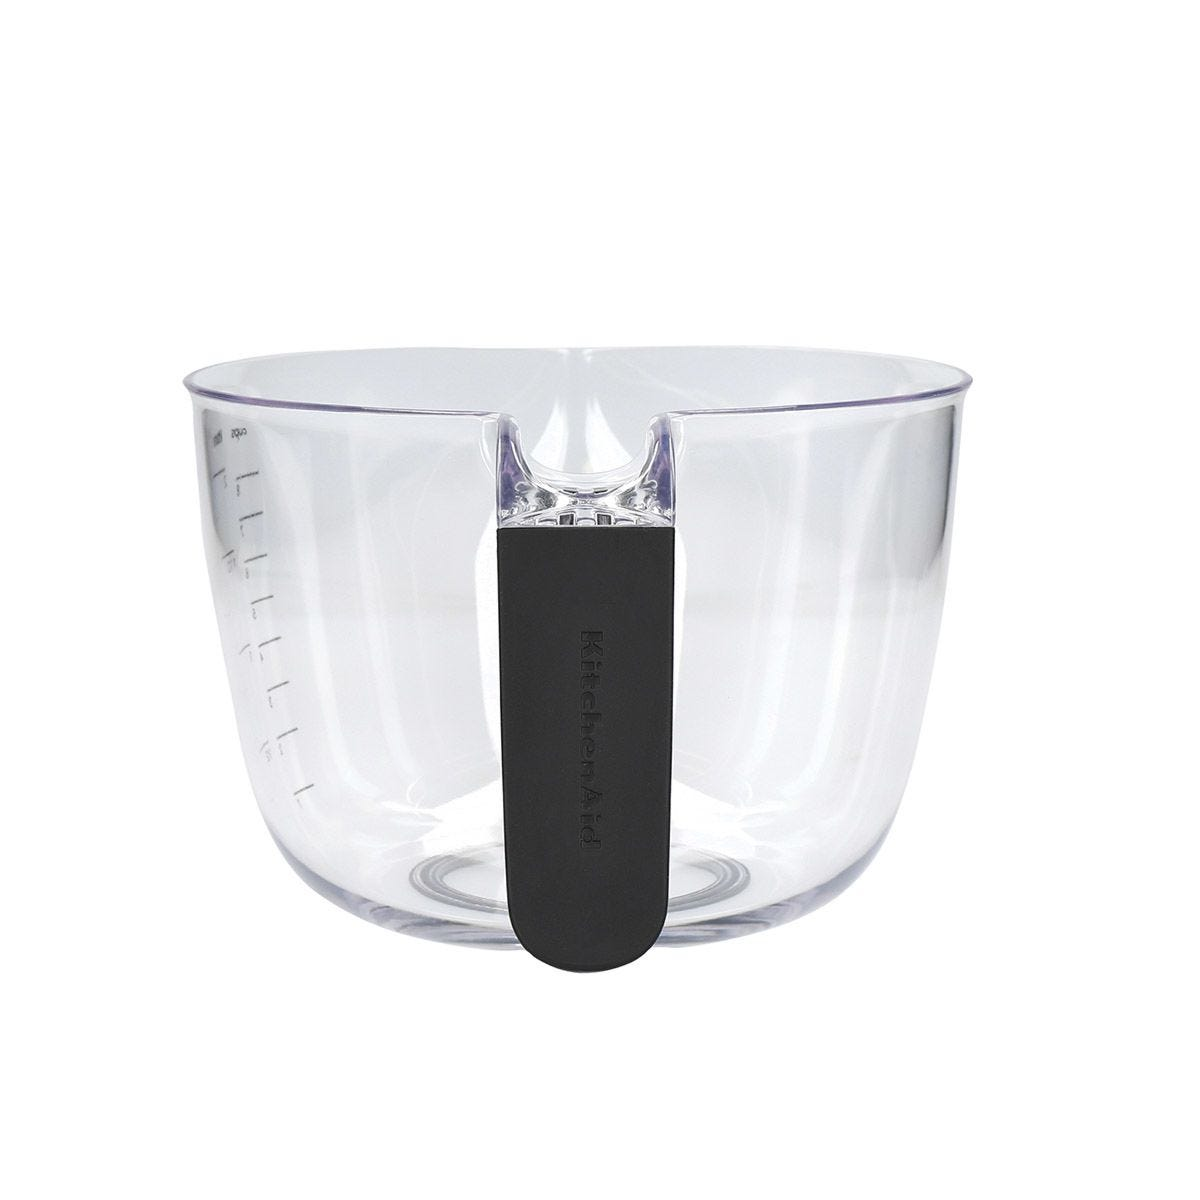 KitchenAid 8 Cup Batter Bowl - Black